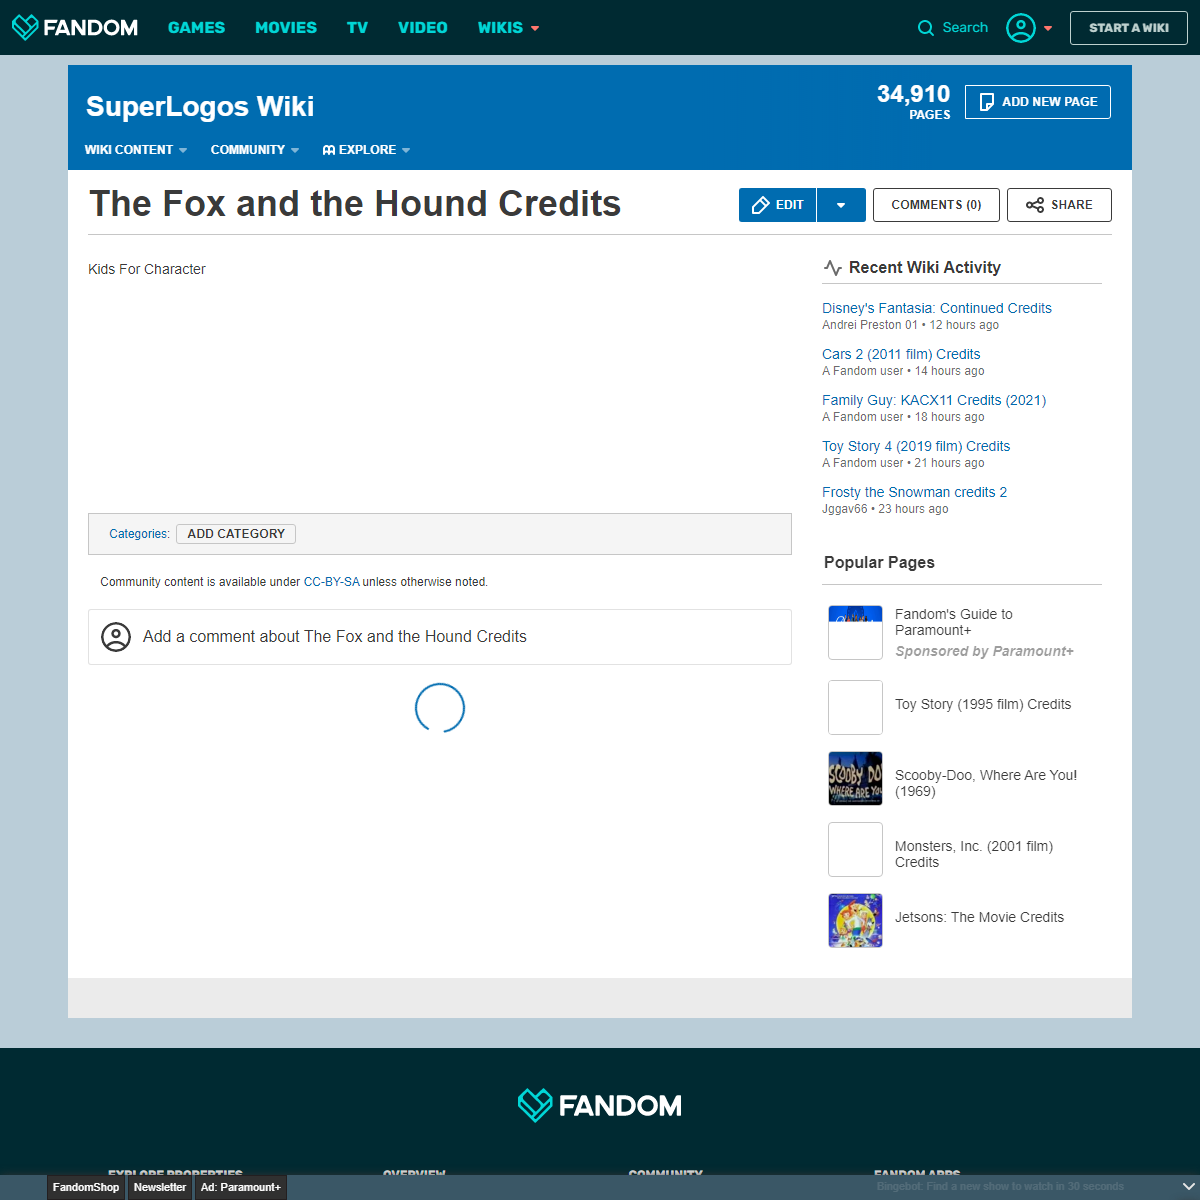 The Fox and the Hound Credits - SuperLogos Wiki - Fandom